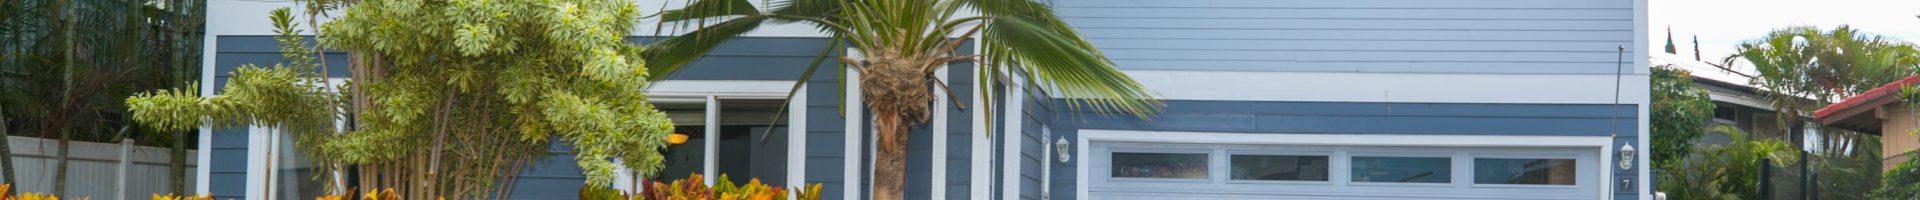 SEASCAPE AT MAKAKILO |  KAPOLEI